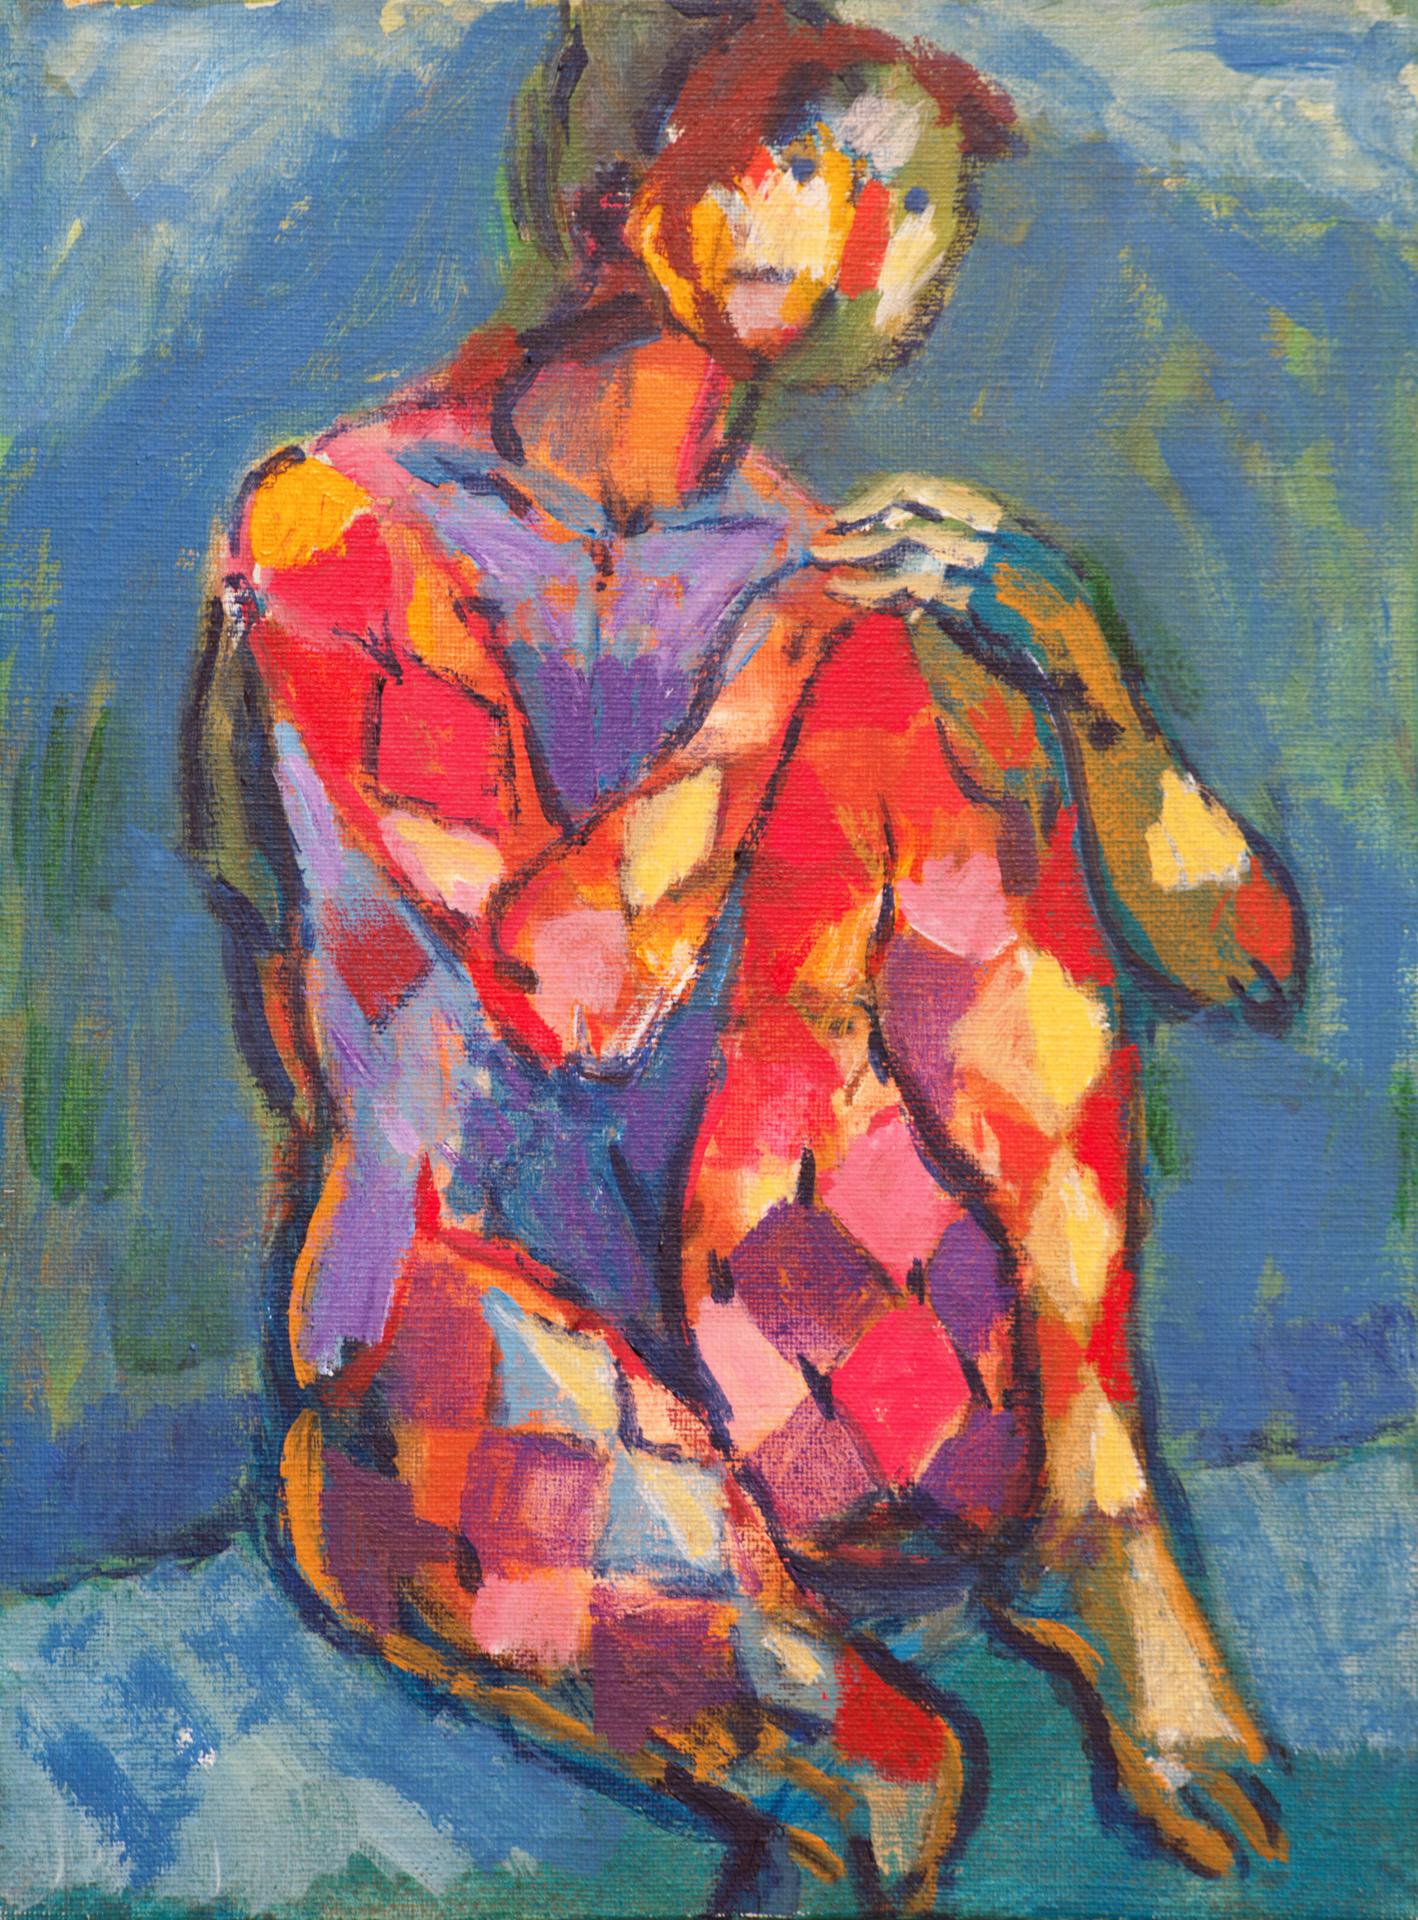 Harlequin IV  / 1996 / oil on canvas / 30x40 cm